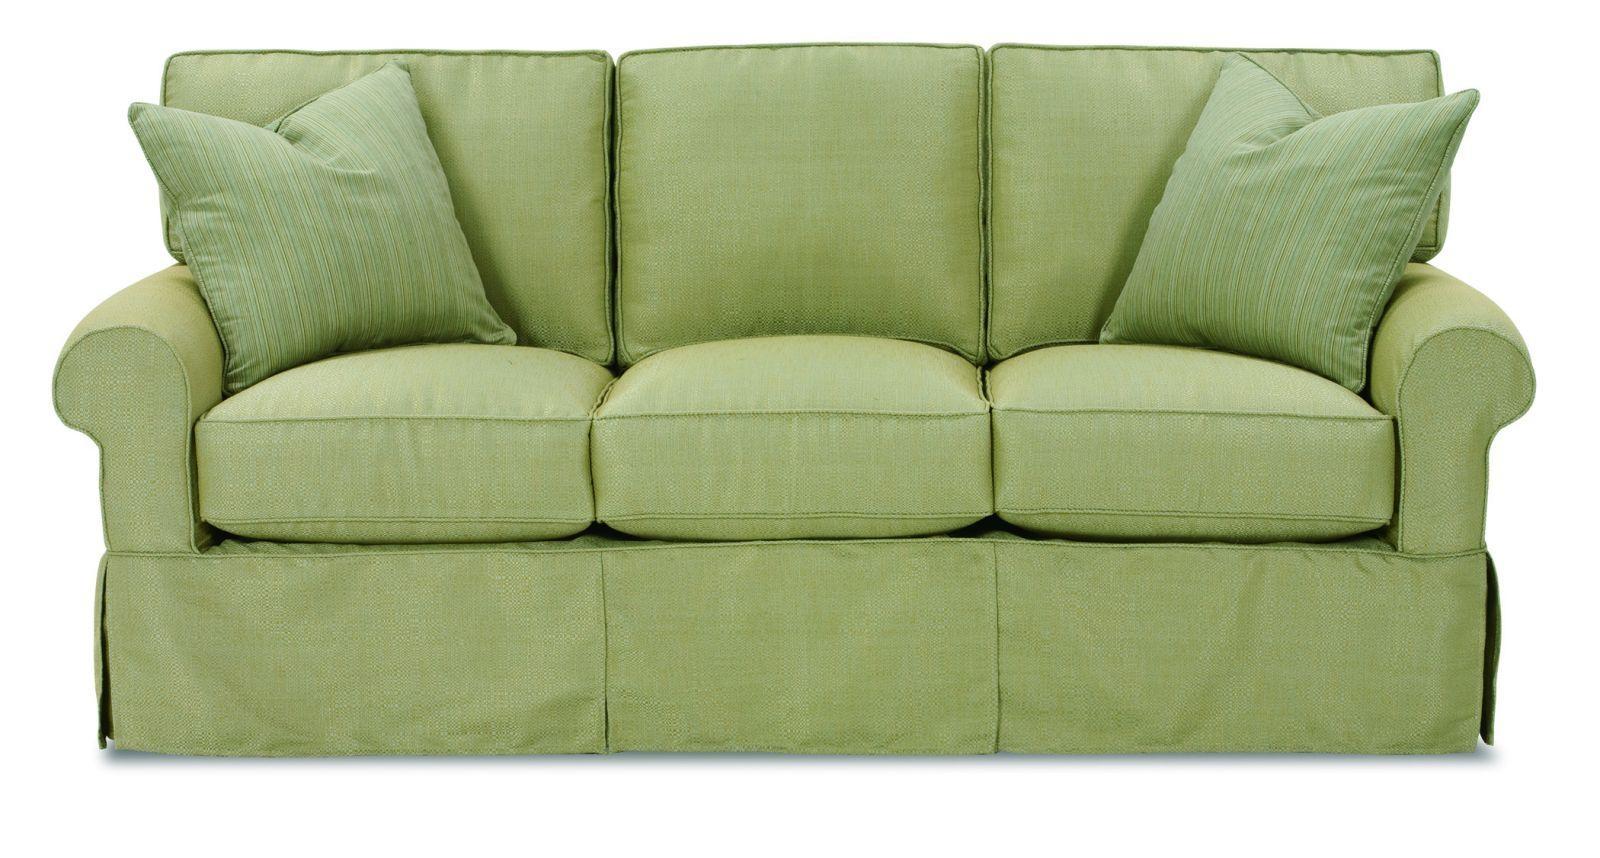 sofa slipcovers three cushions greccio leather 20 best for 3 cushion sofas ideas